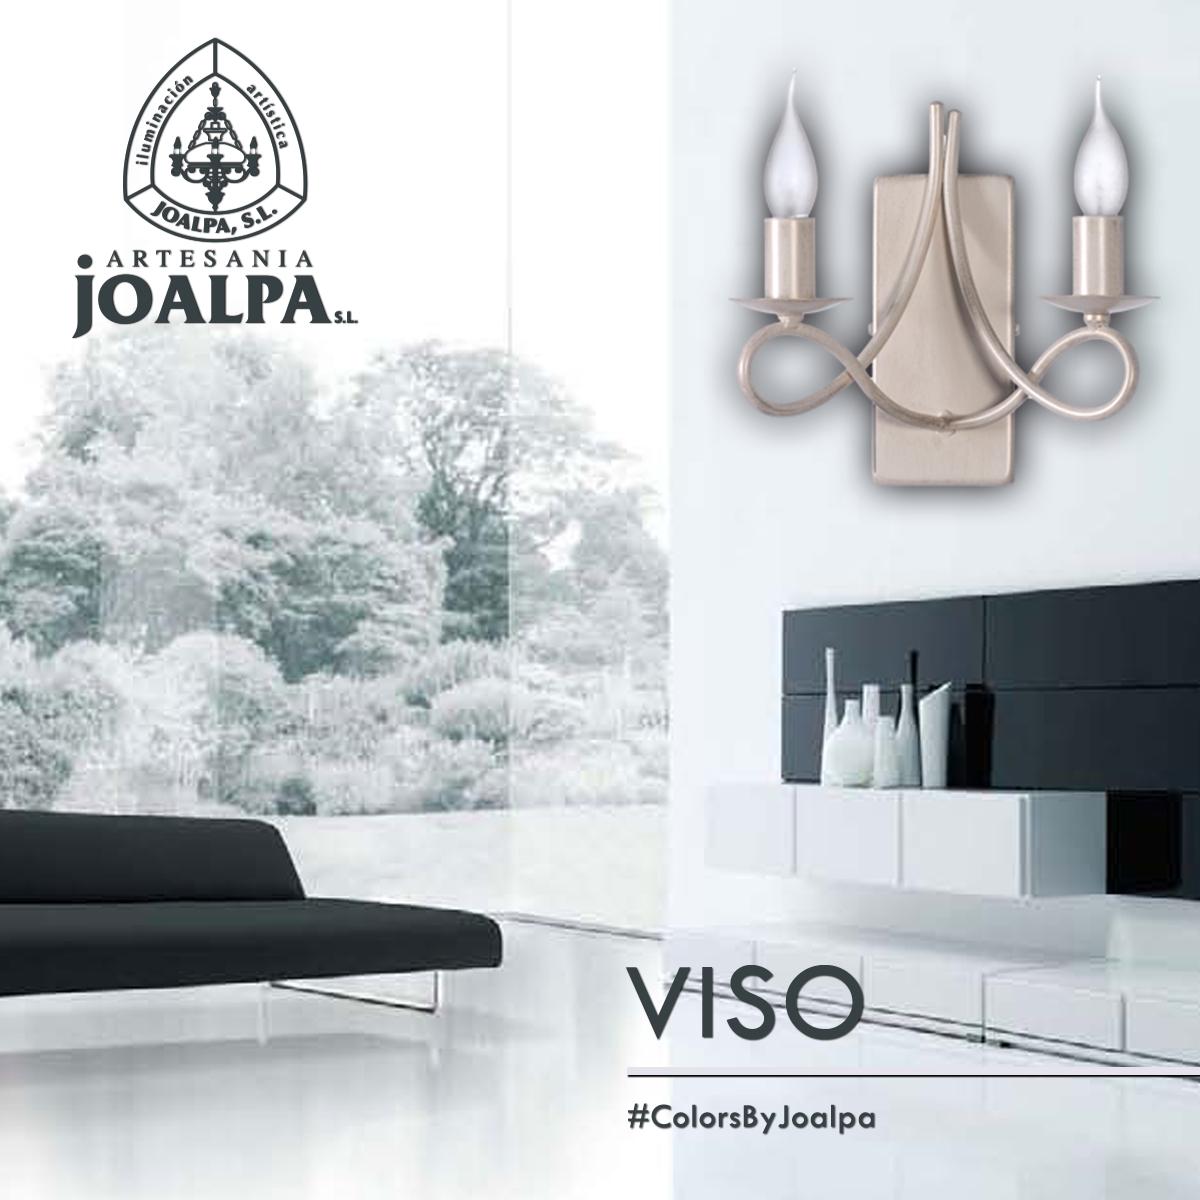 Aplique de pared VISO, elegancia discreta bajo la magia de la luz de #ArtesaniaJoalpaSL #ColorsByJoalpa